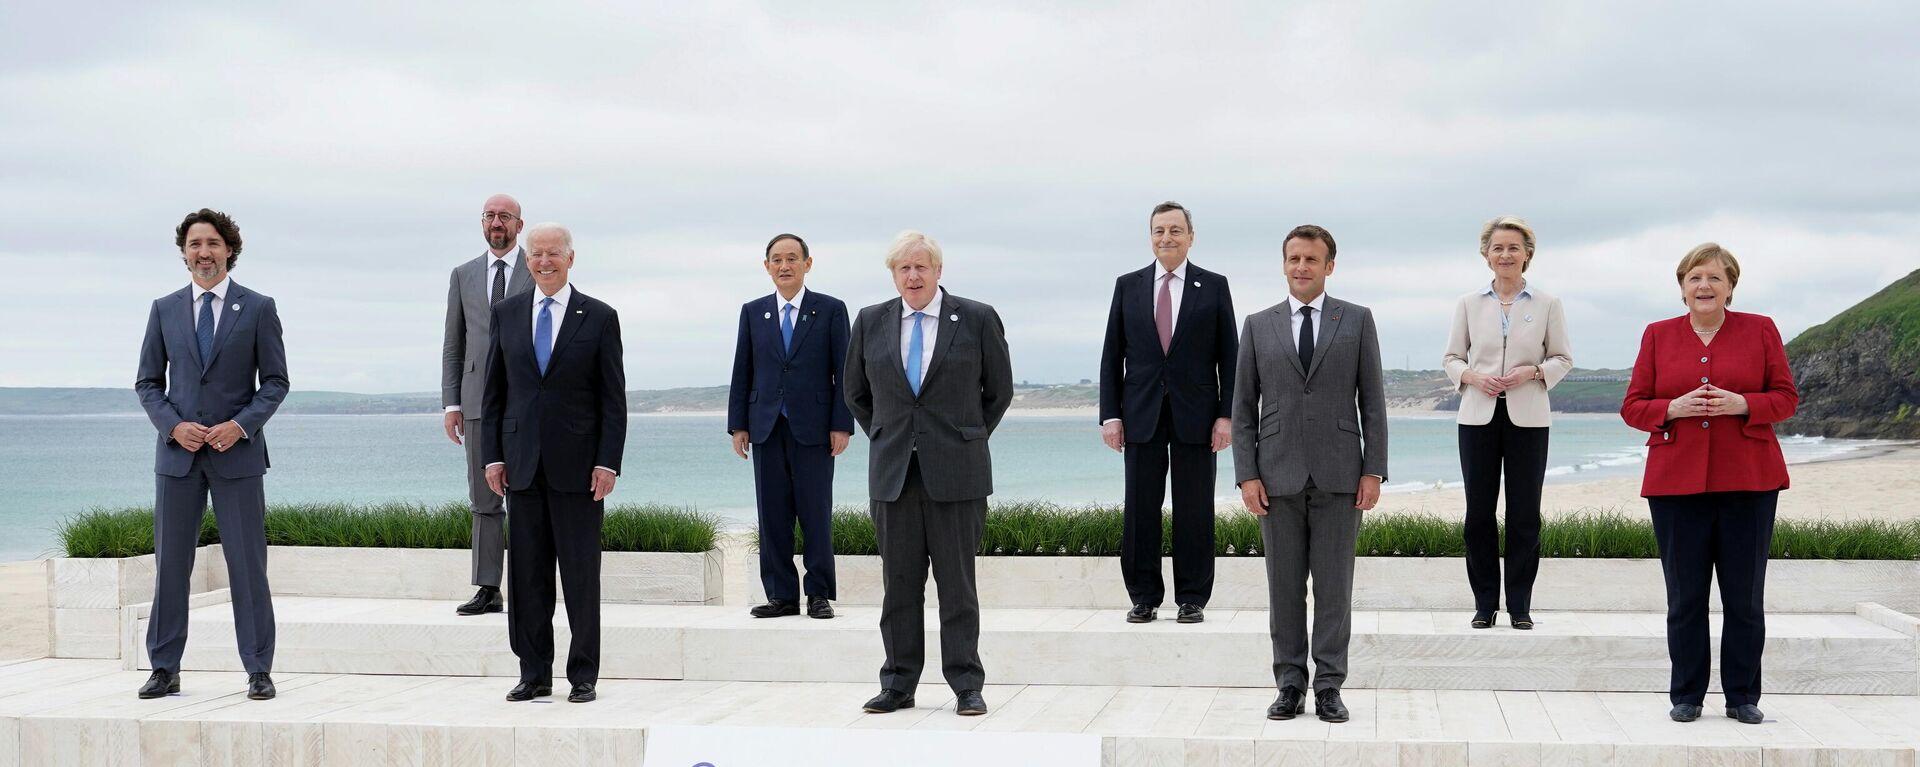 Участники саммита G7 в Великобритании - Sputnik Узбекистан, 1920, 15.06.2021